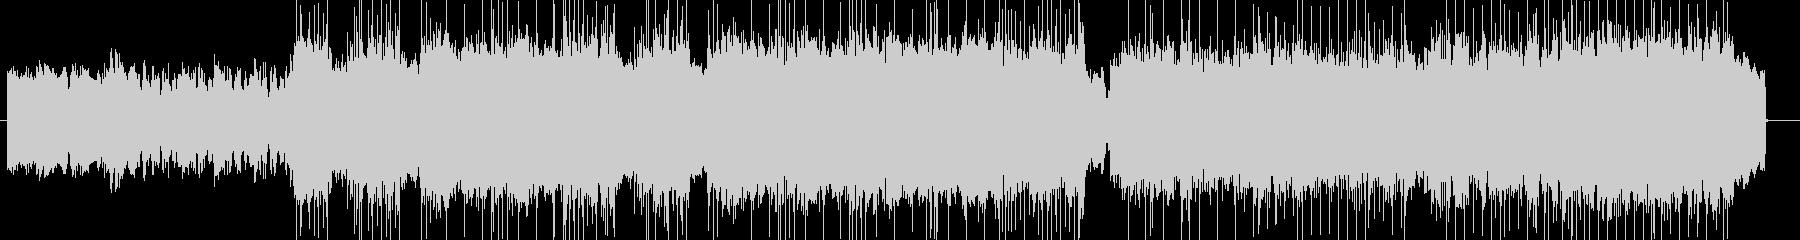 「HR/HM」「DARK」BGM136の未再生の波形